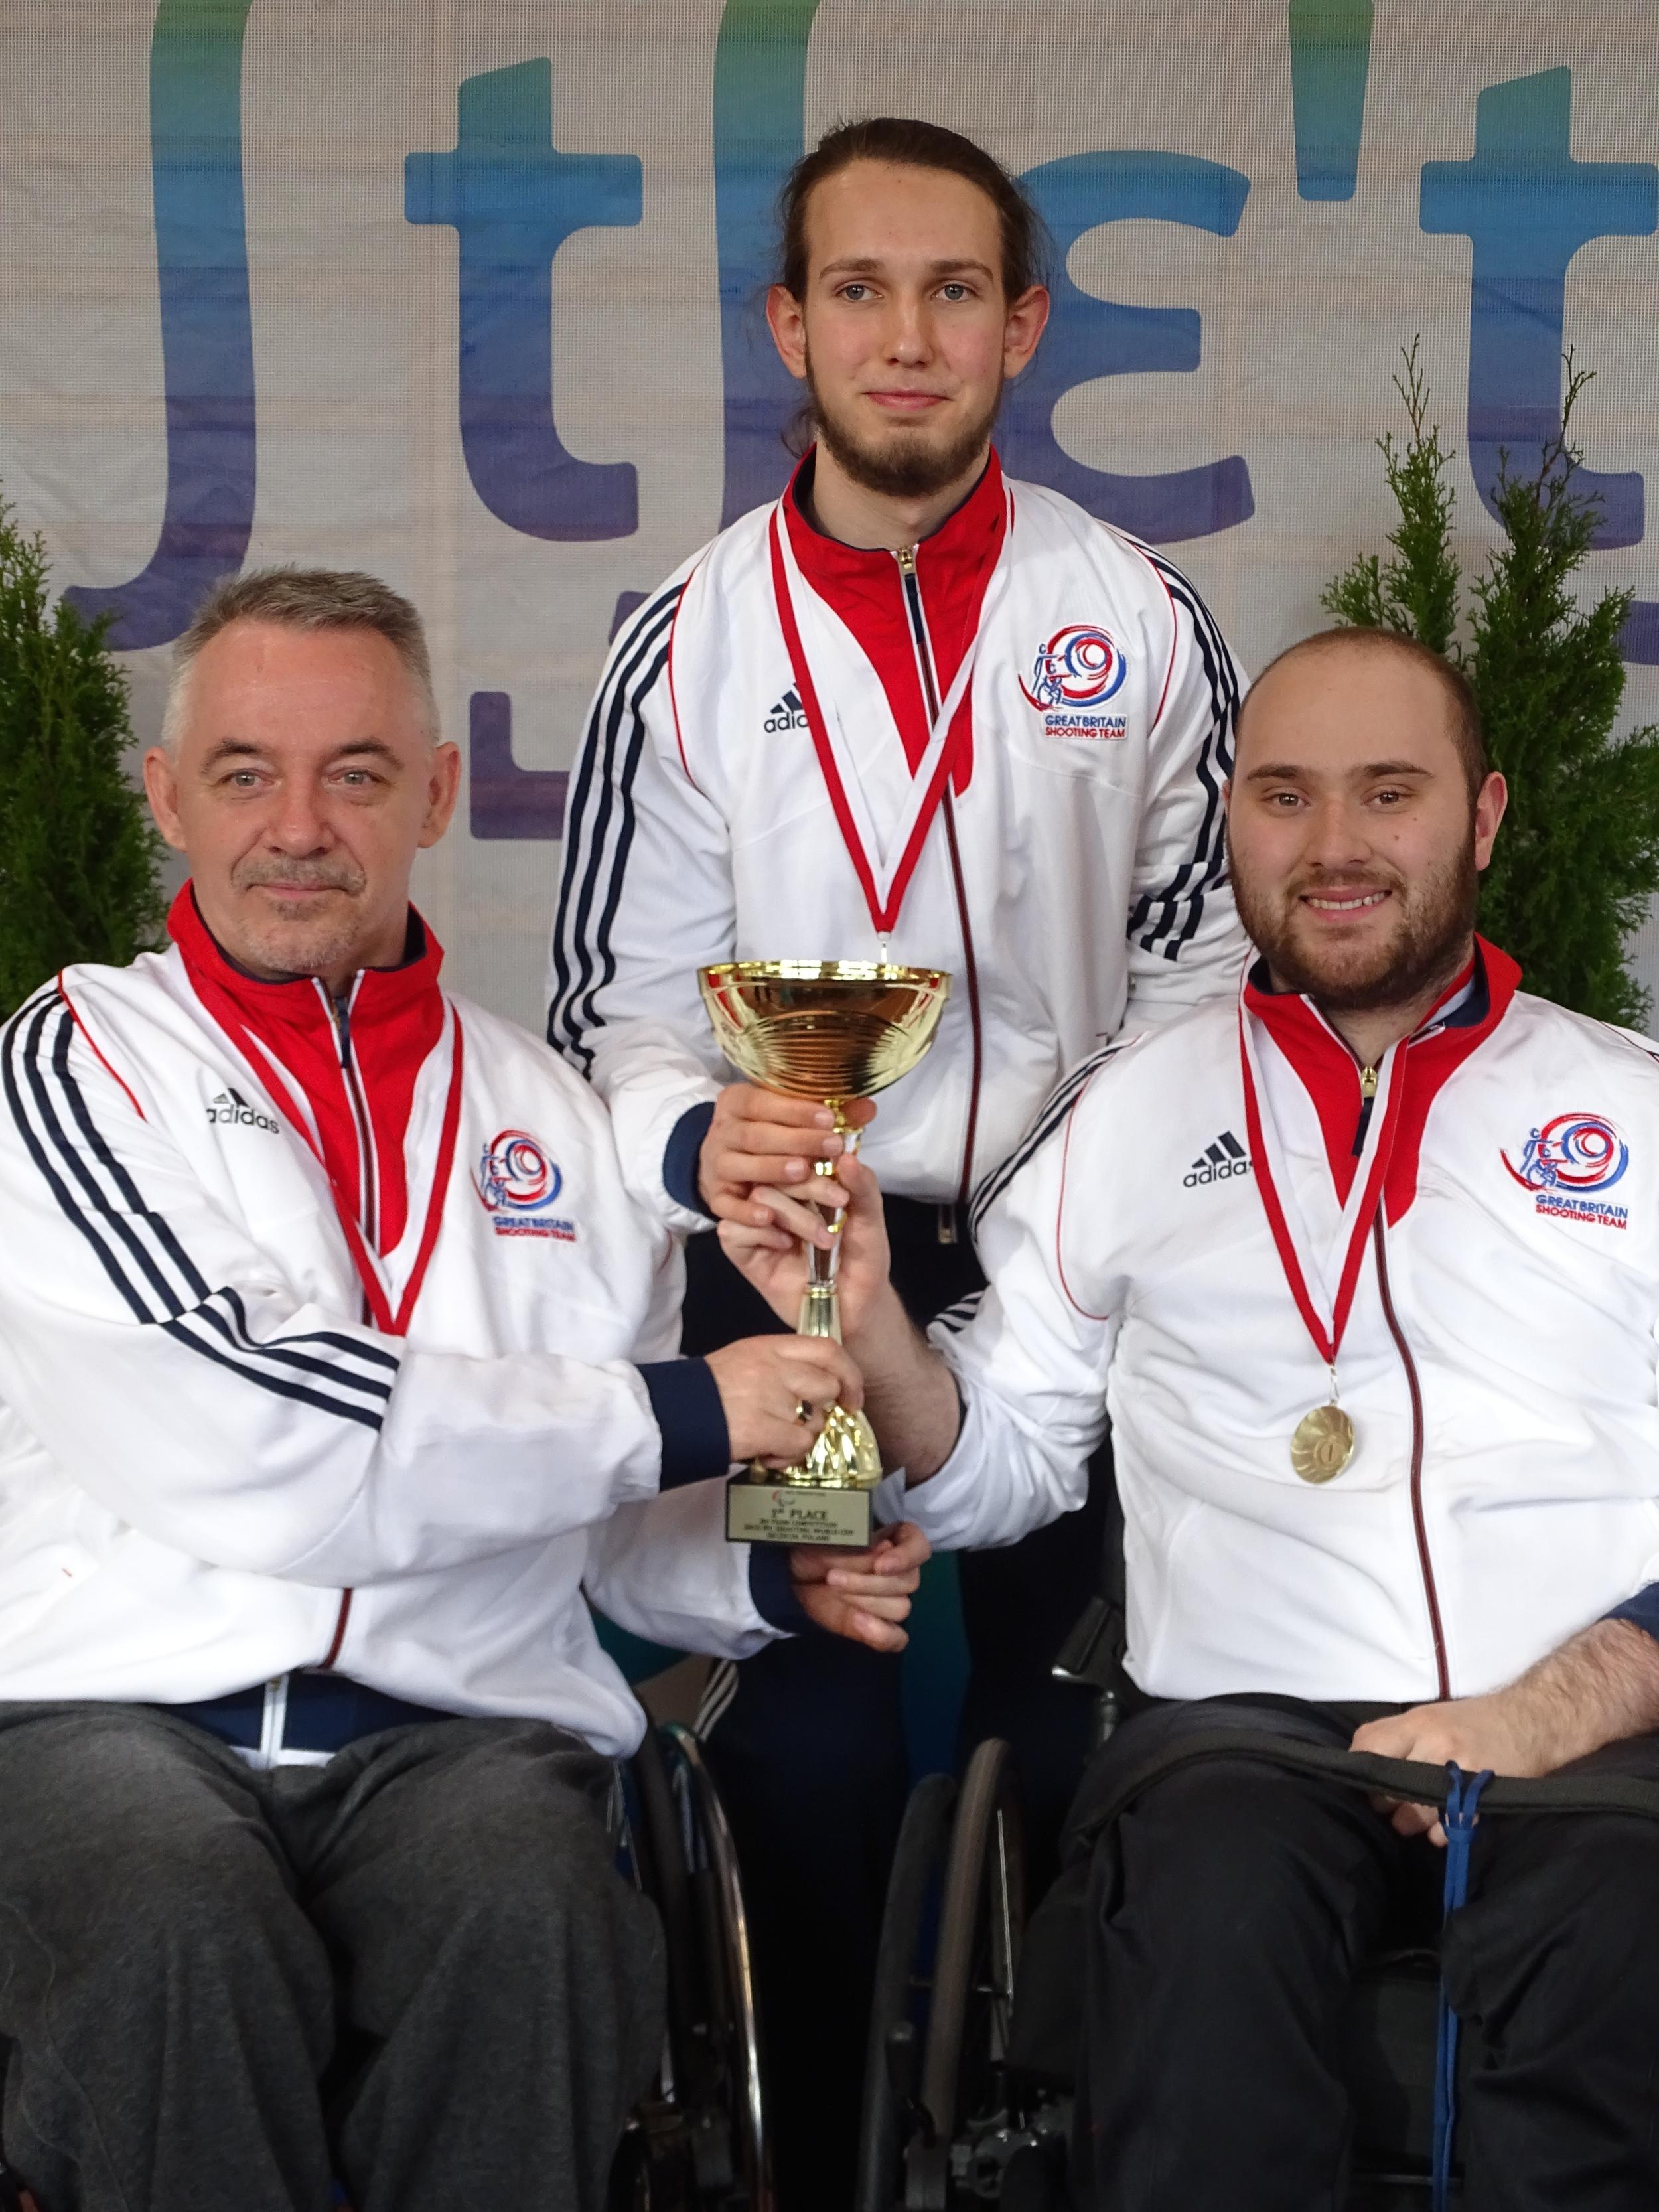 R4 Team Gold medallists (McLeary, Jeffery, Cockbill)